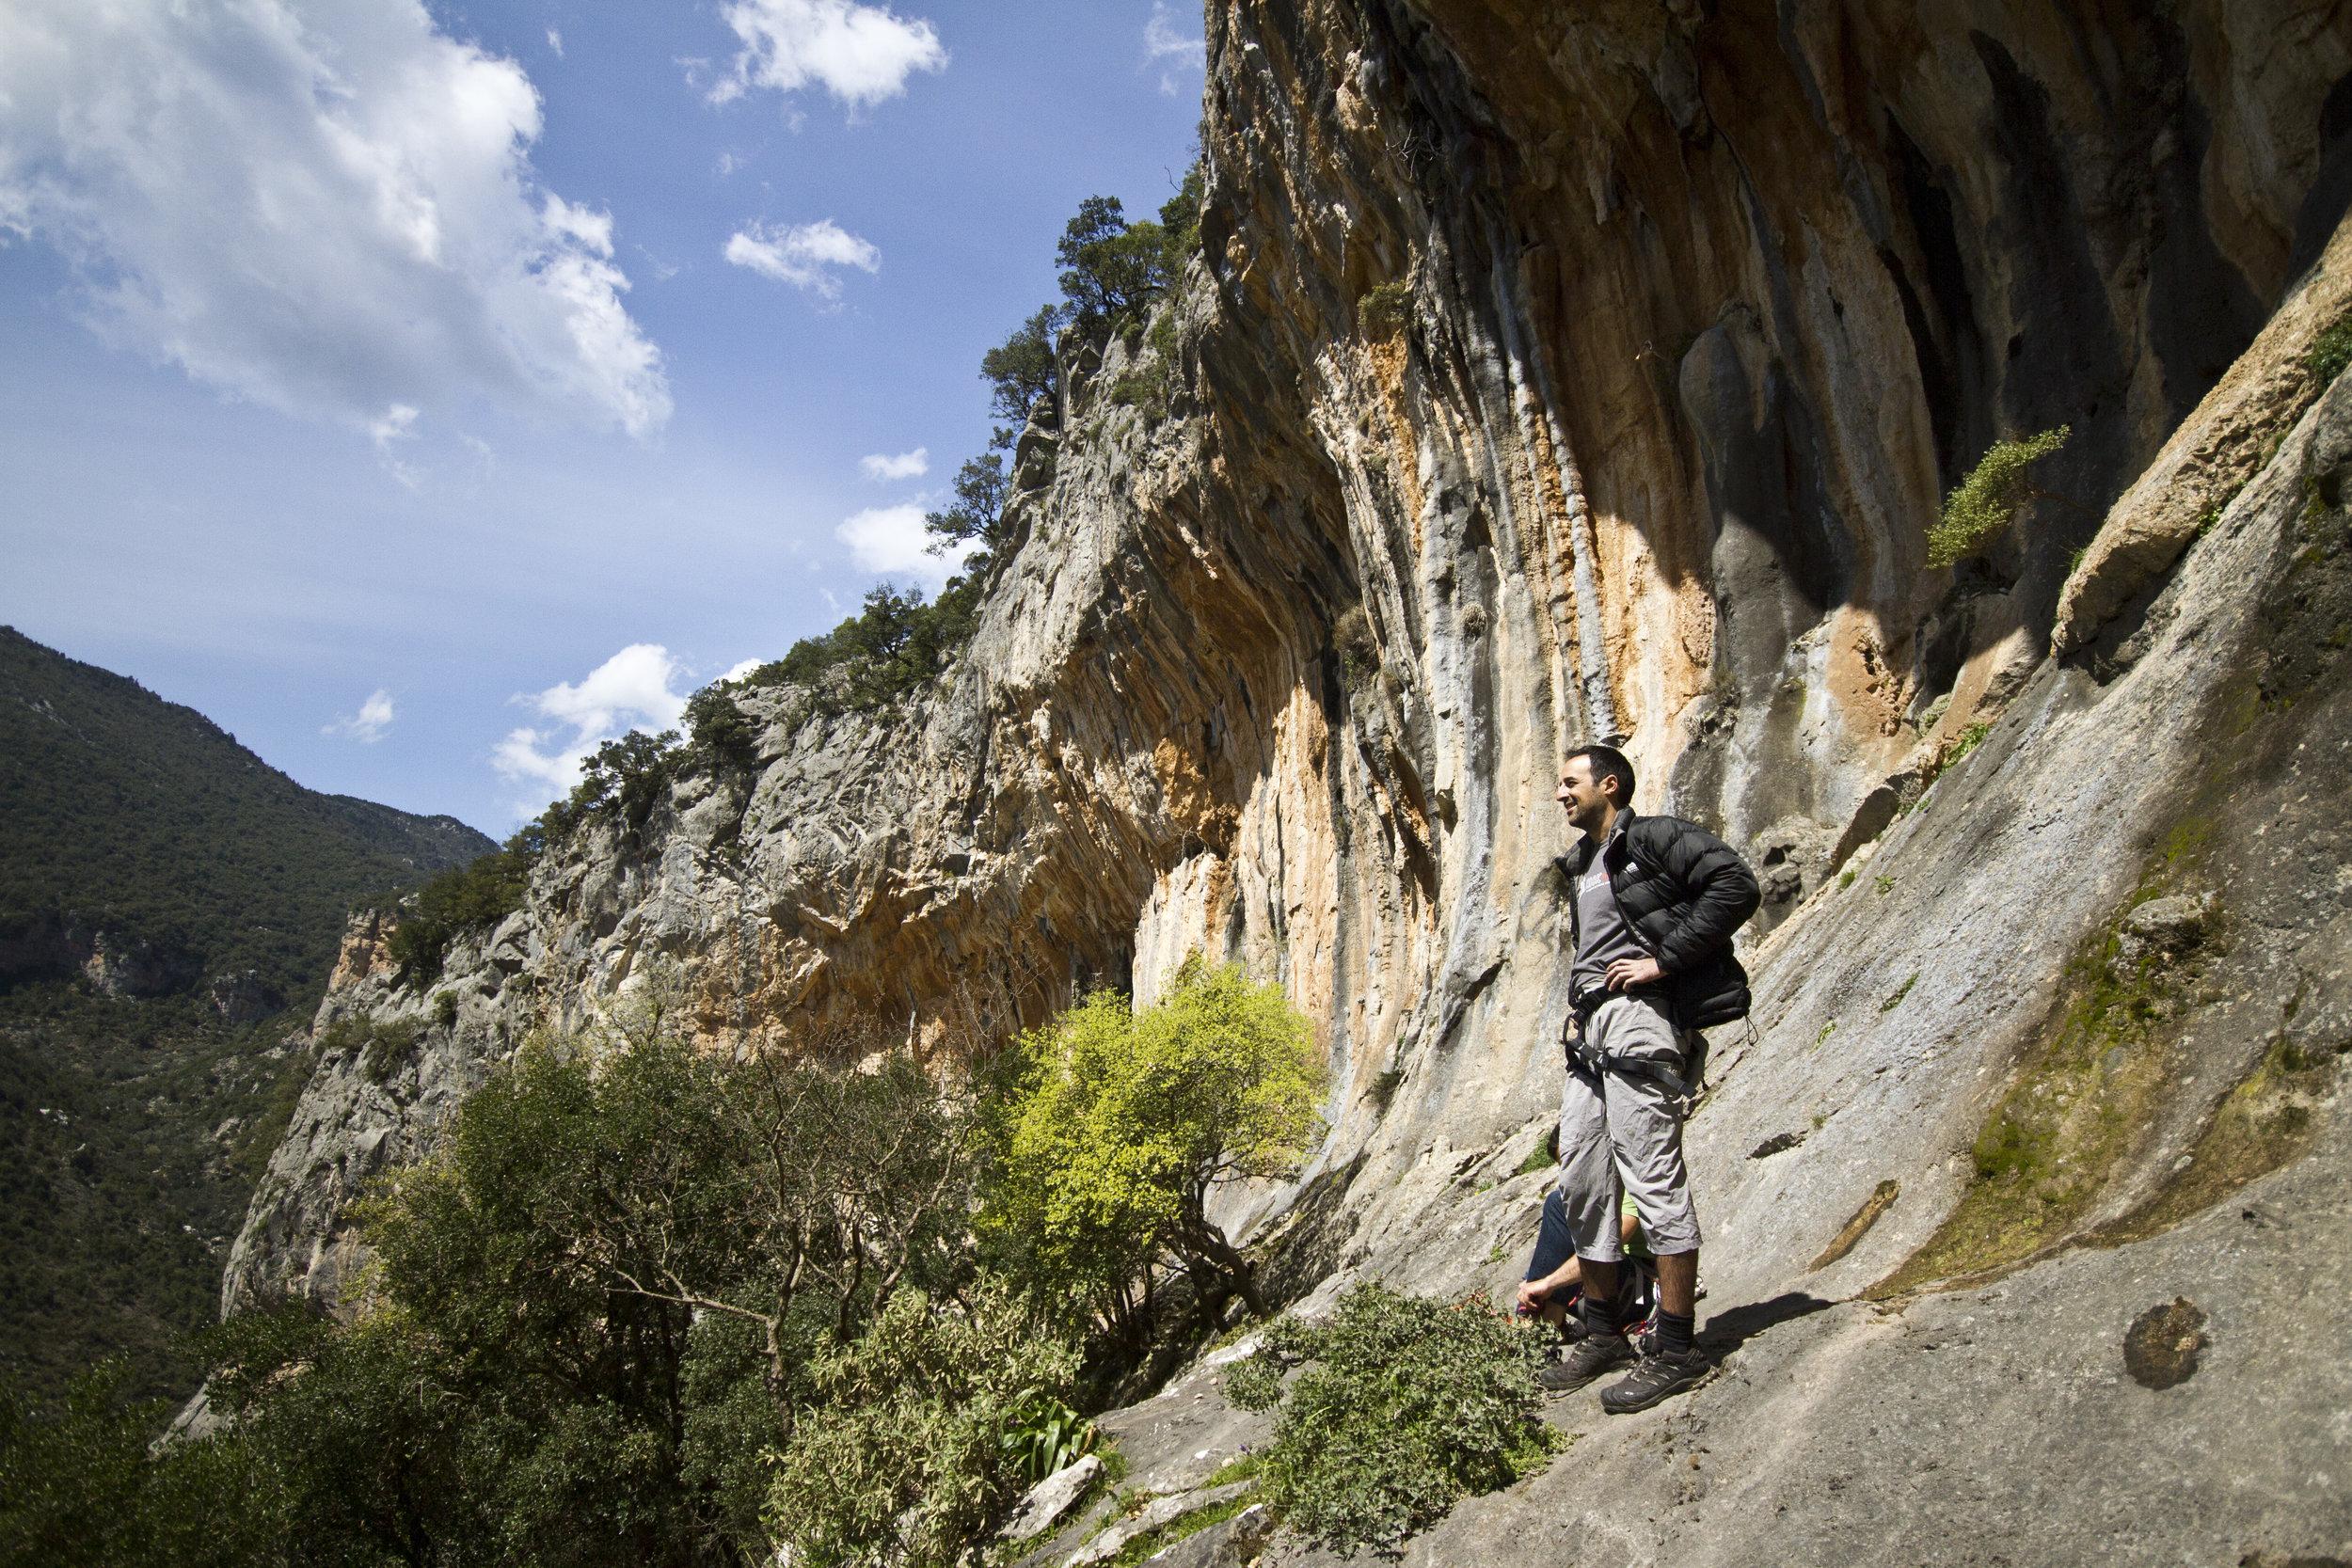 Georgios enjoying the view of Greek cliffs.